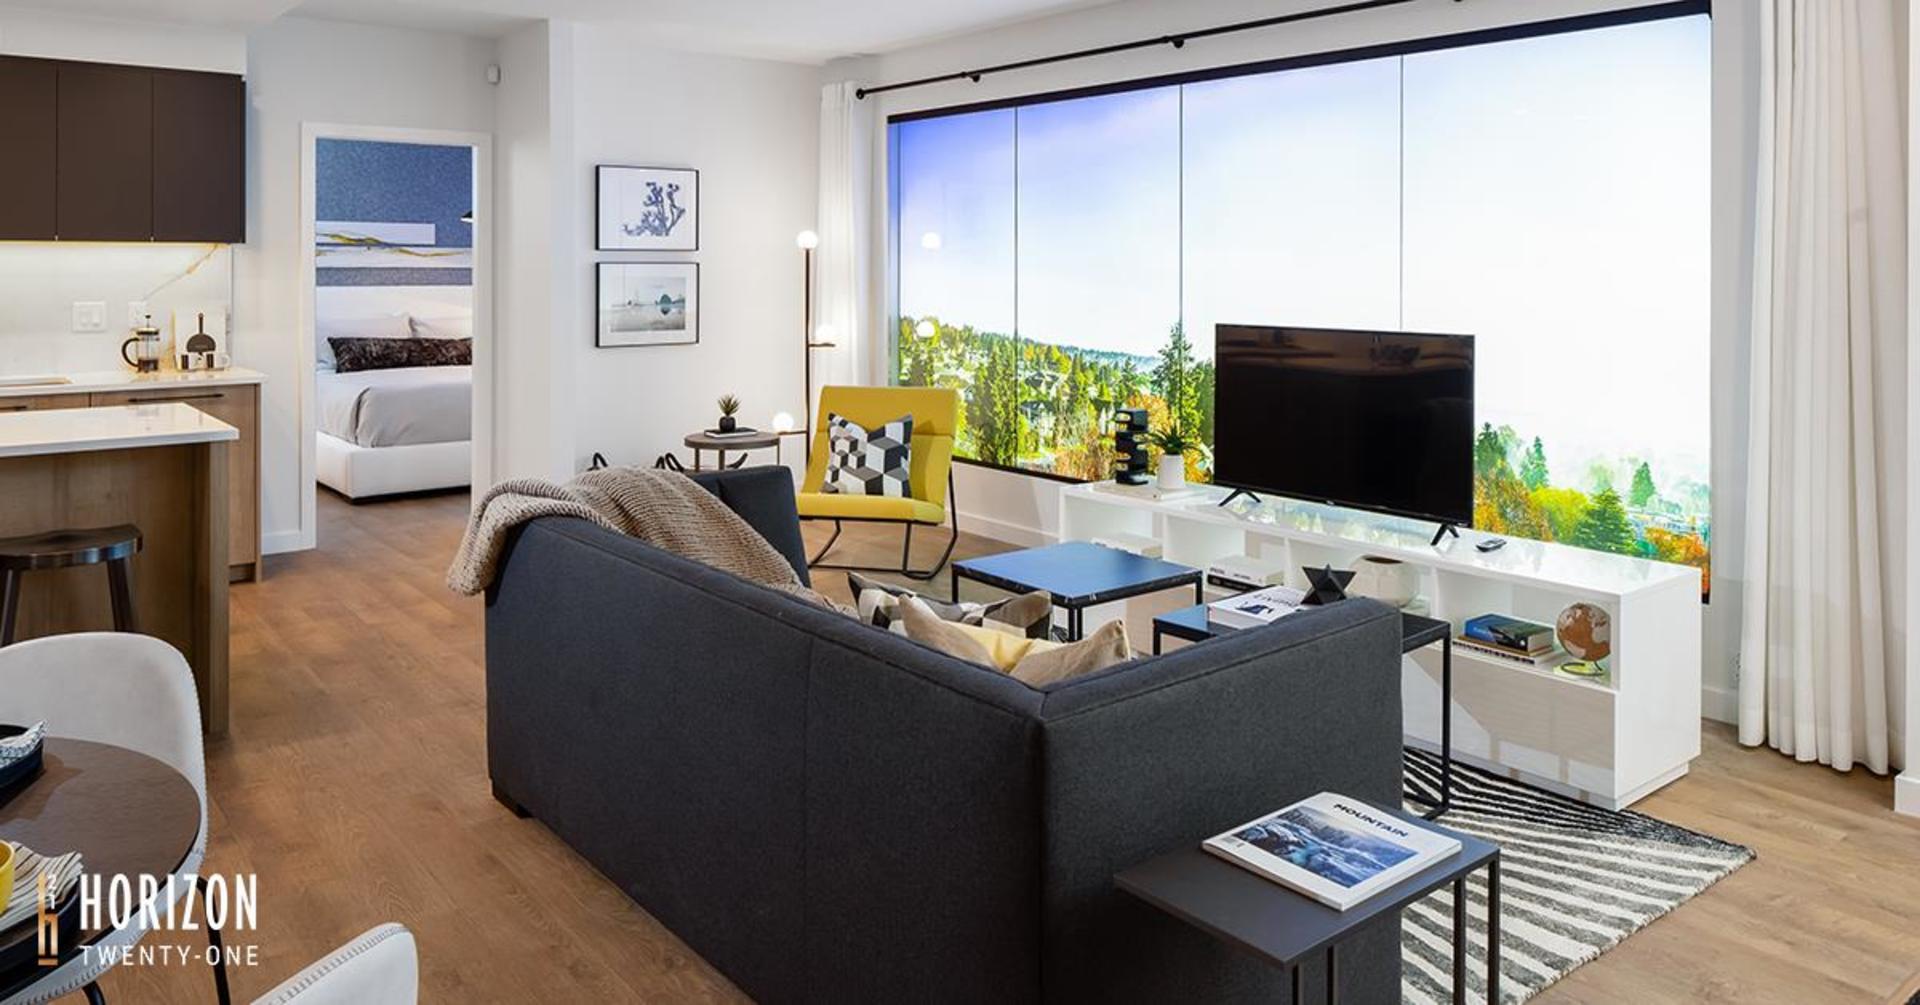 horizon-21-living-room at Horizon 21 (218 Blue Mountain, Maillardville, Coquitlam)